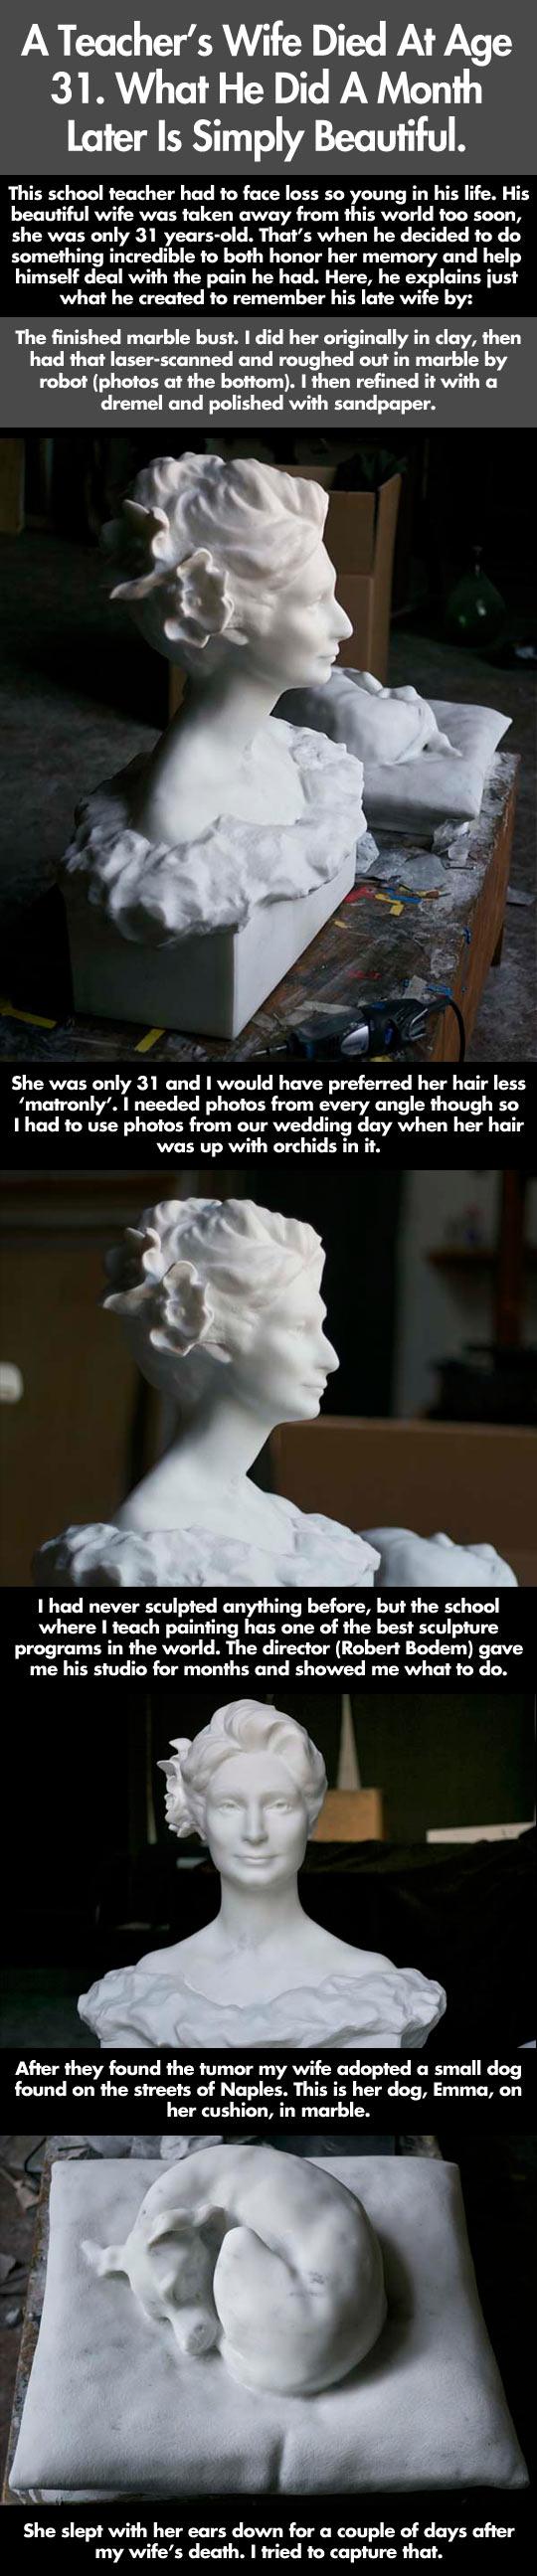 cool-teacher-wife-marble-bust